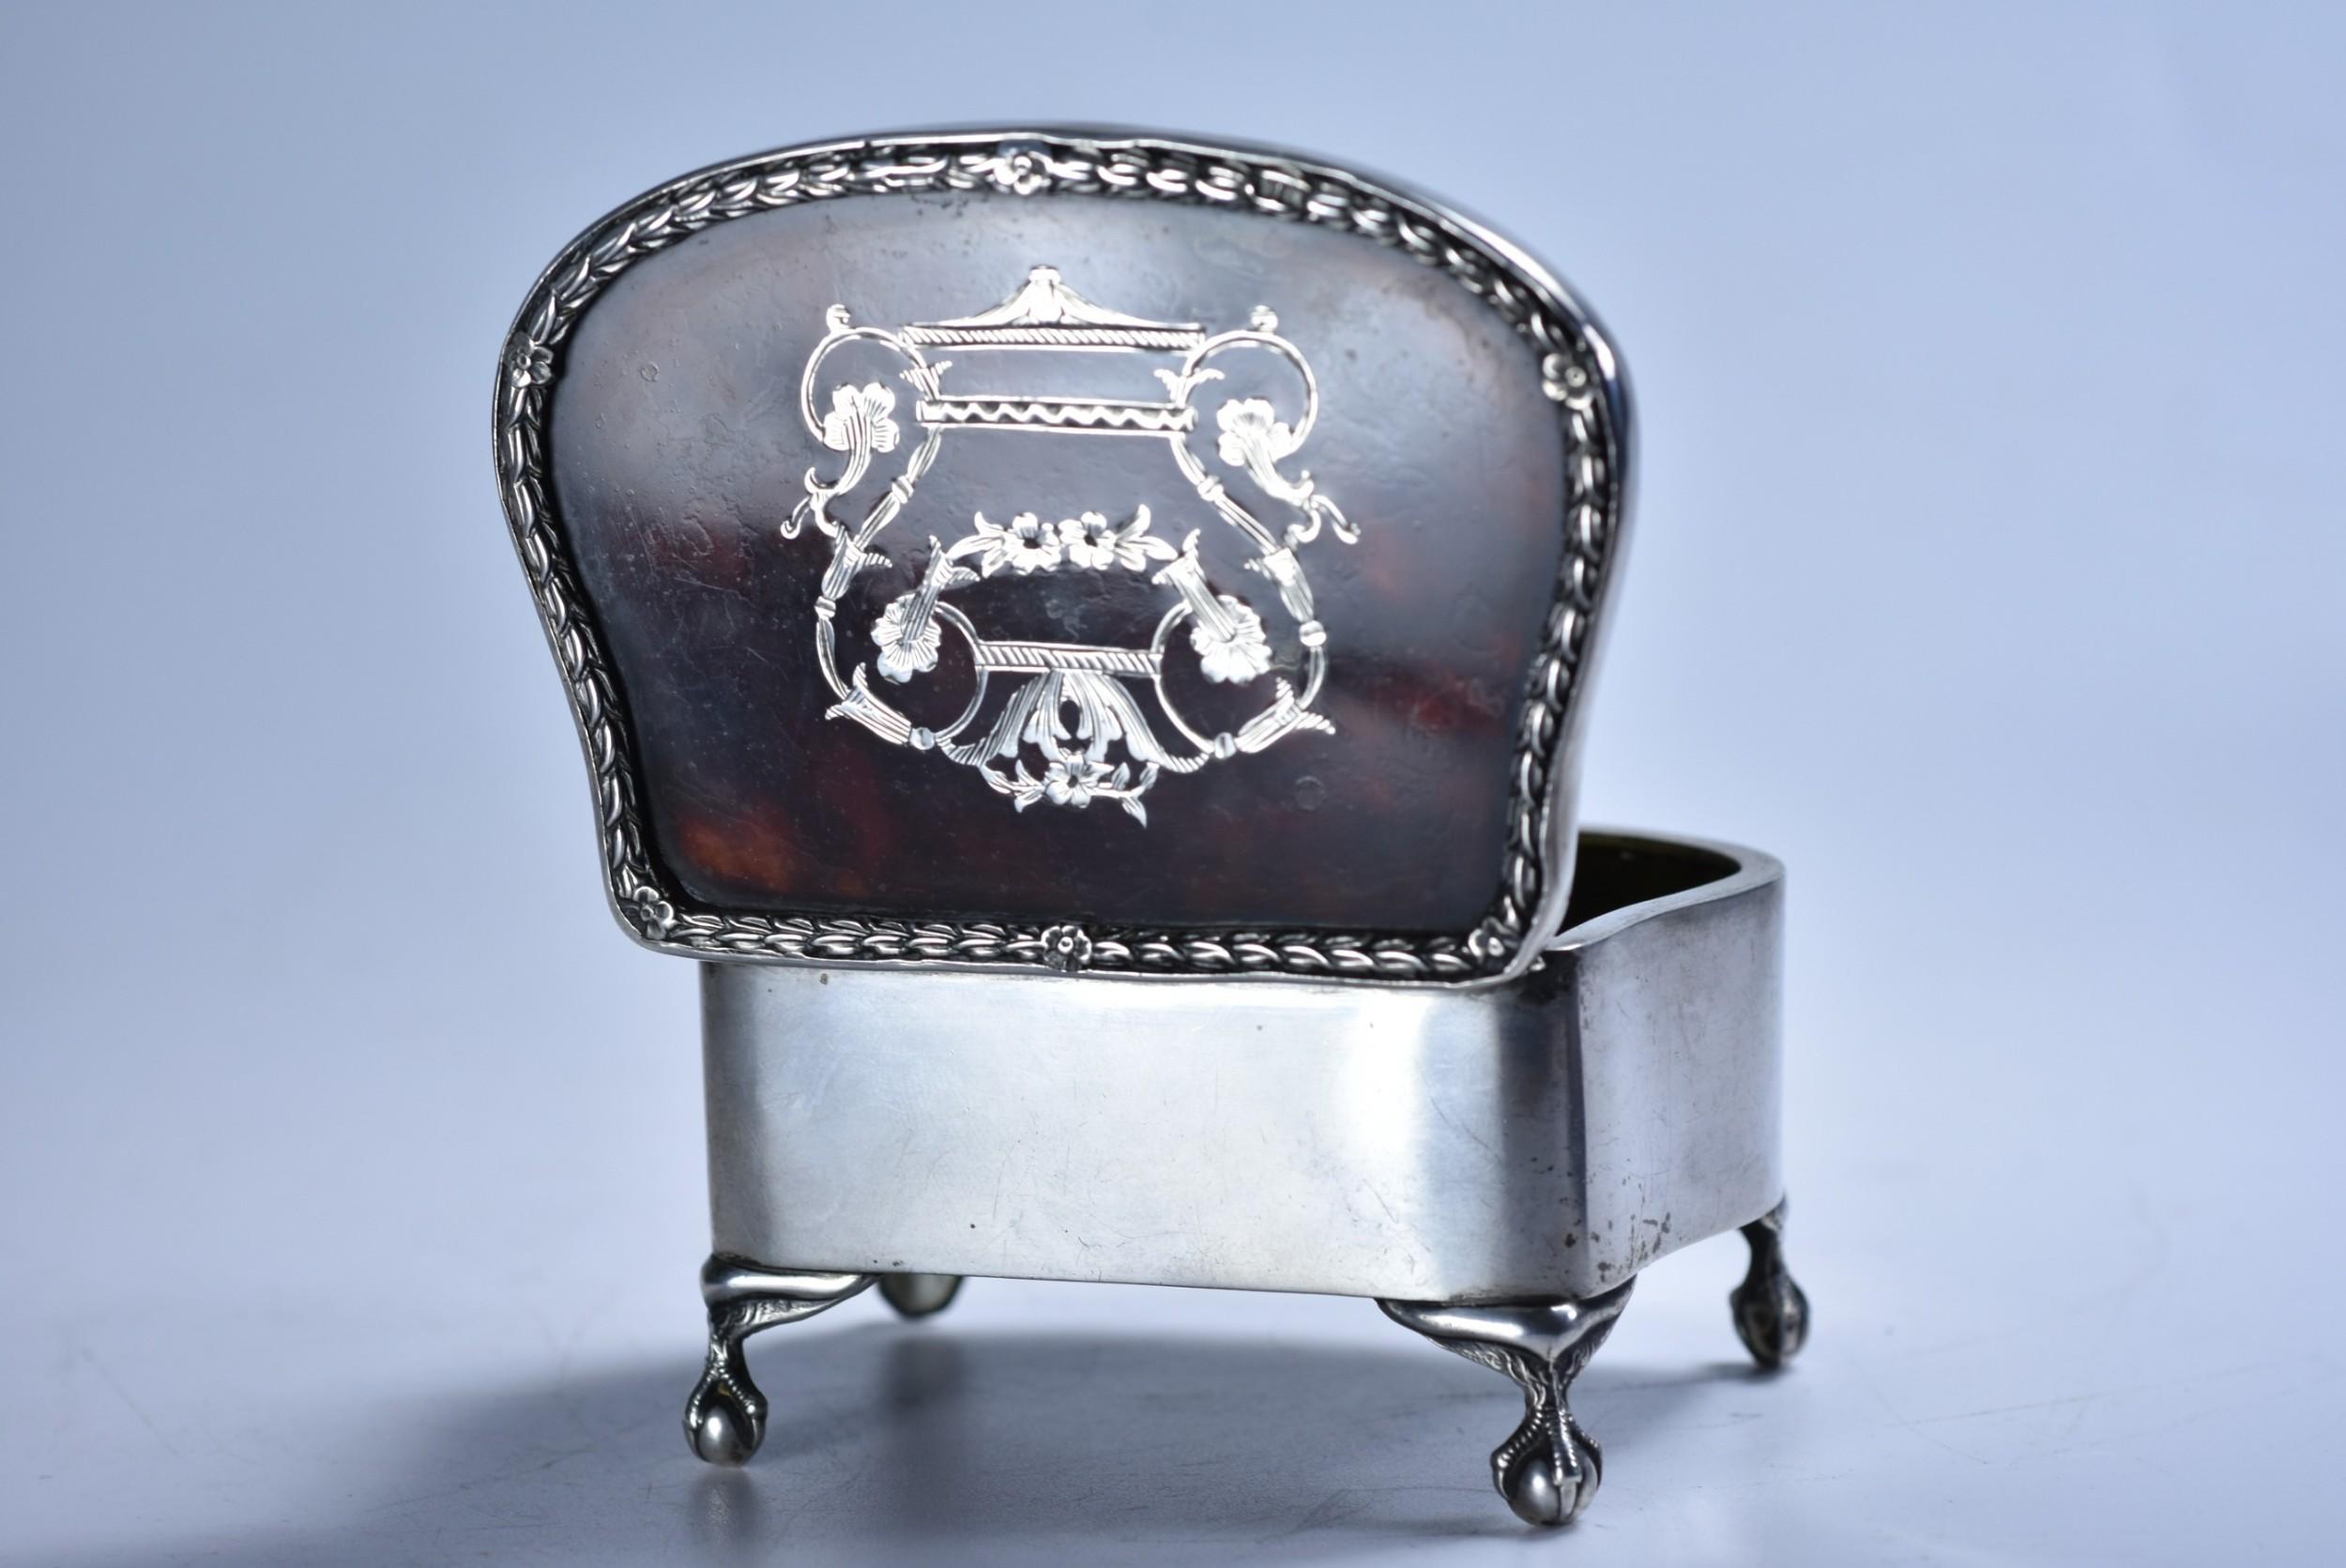 edwardian sterling silver tortoiseshell trinket box by levi salaman c1906